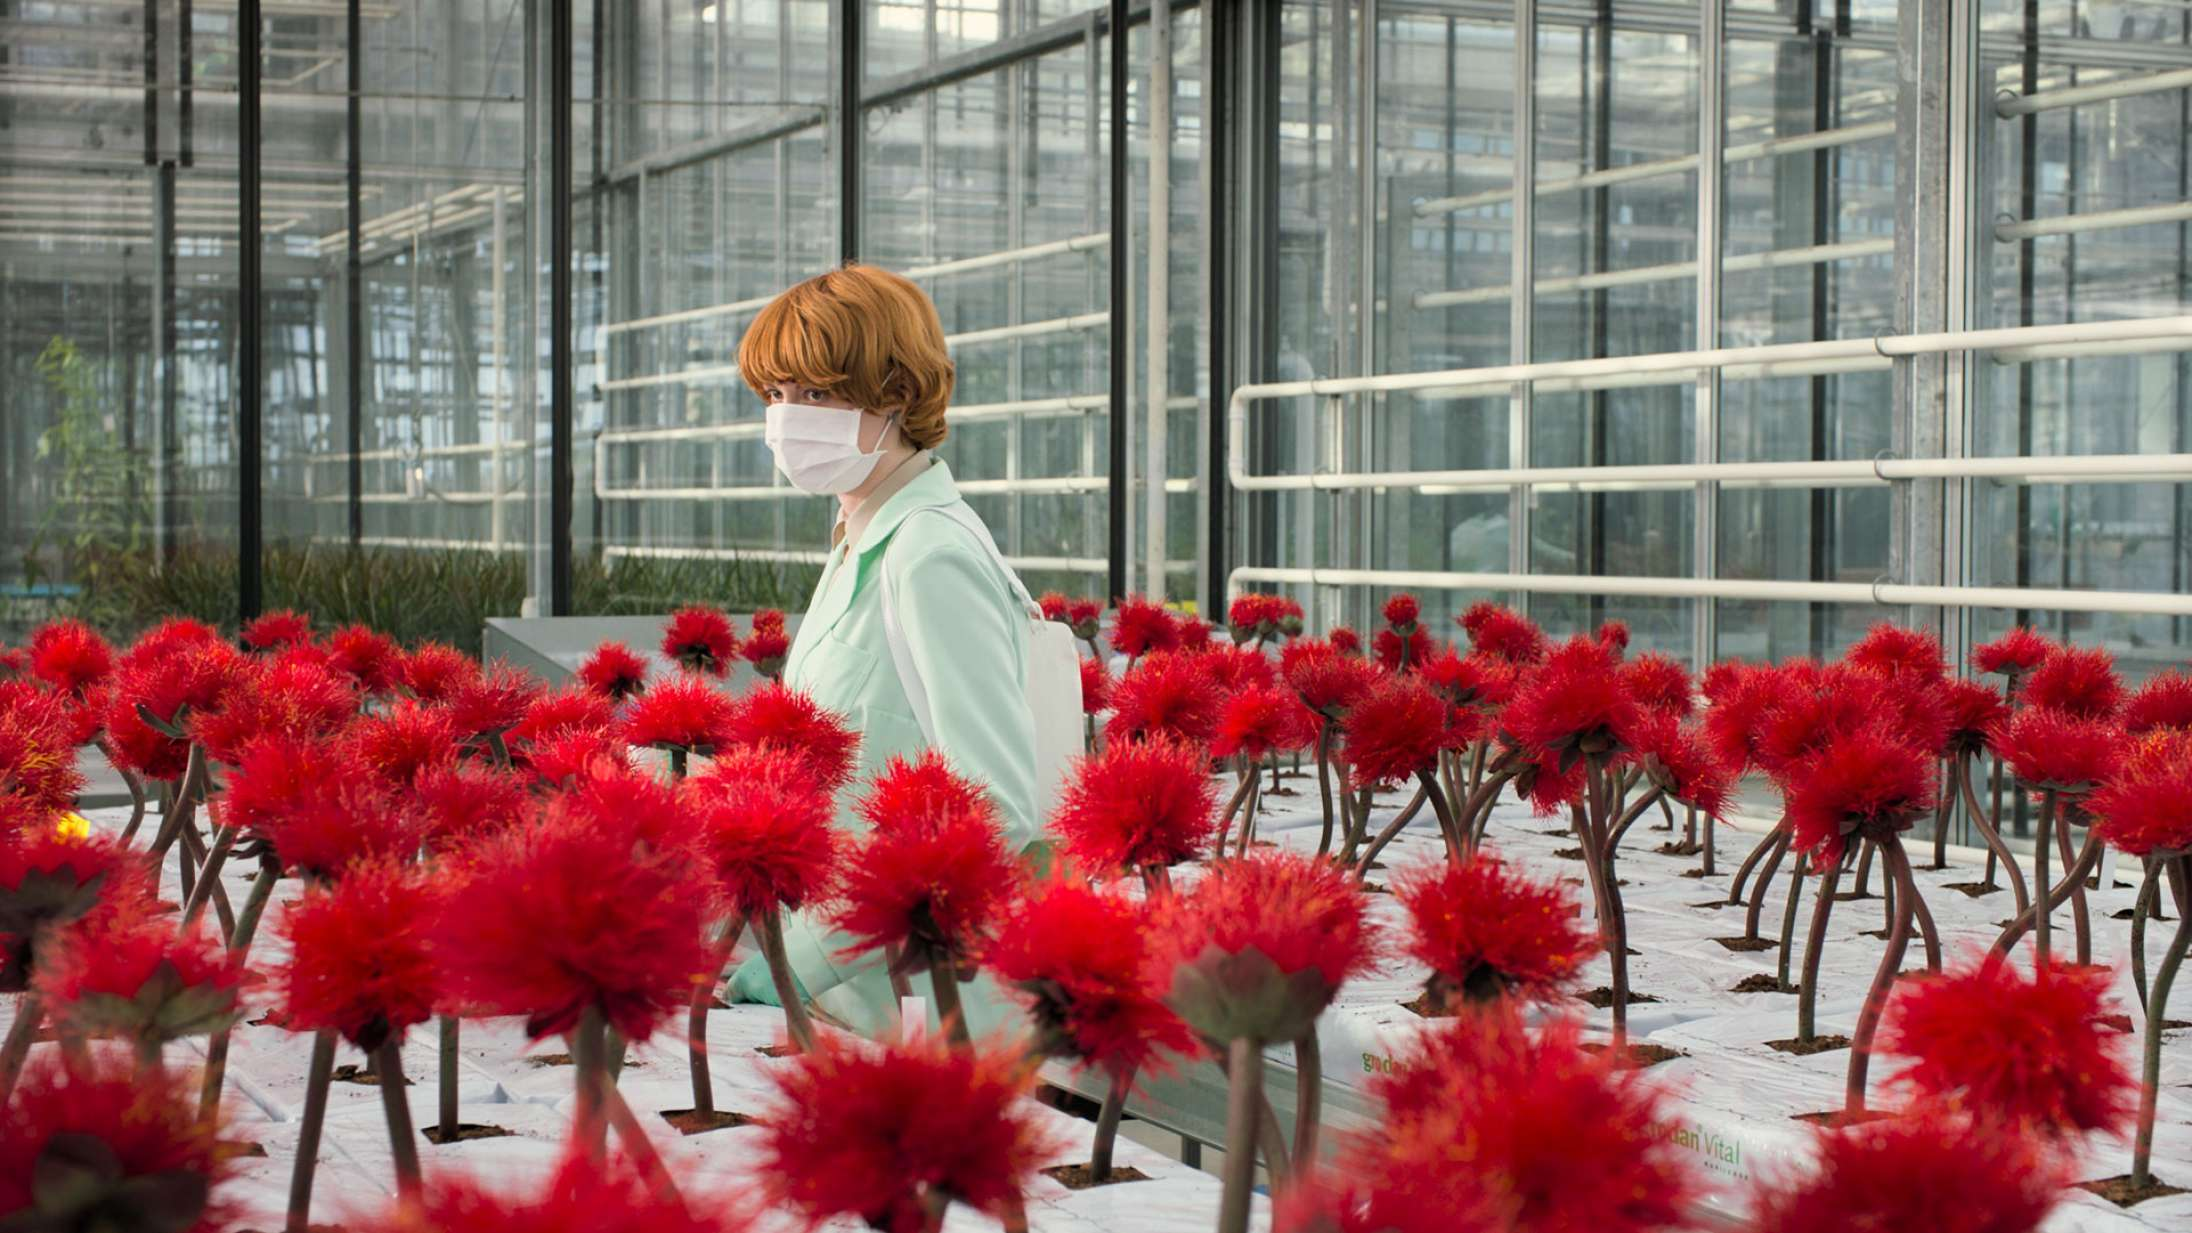 'Little Joe': Psykologisk plantegyser er modelækker og krybende uhyggelig